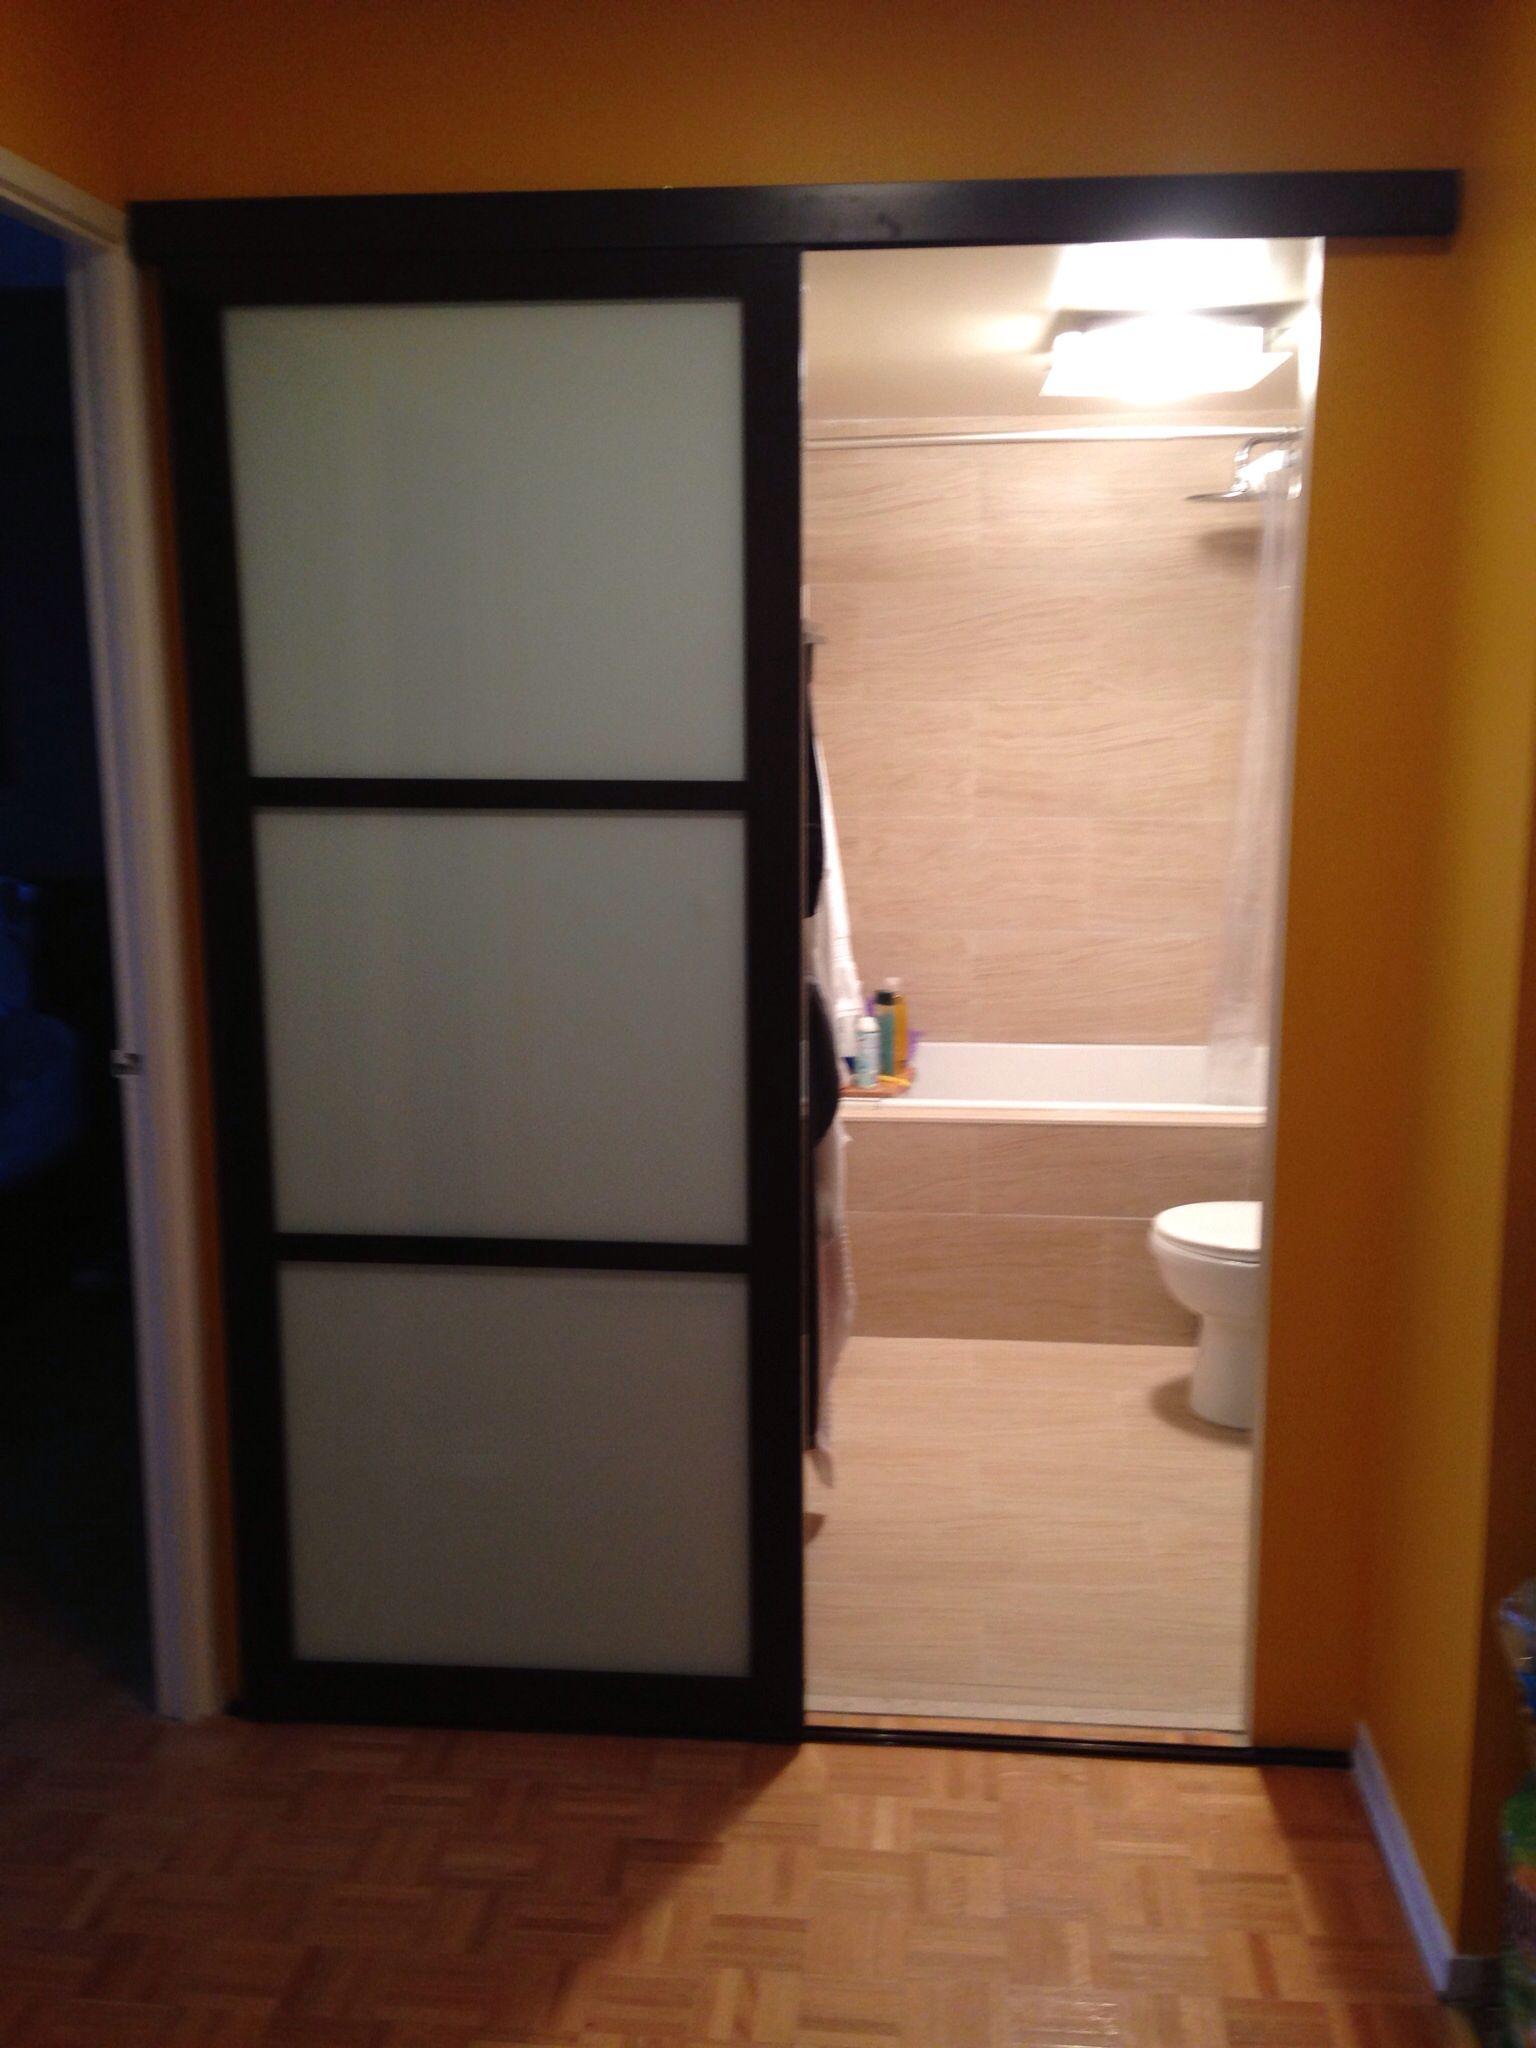 Sexy Bathroom Wall Slide Door Again Eliminating The Swing Has Now